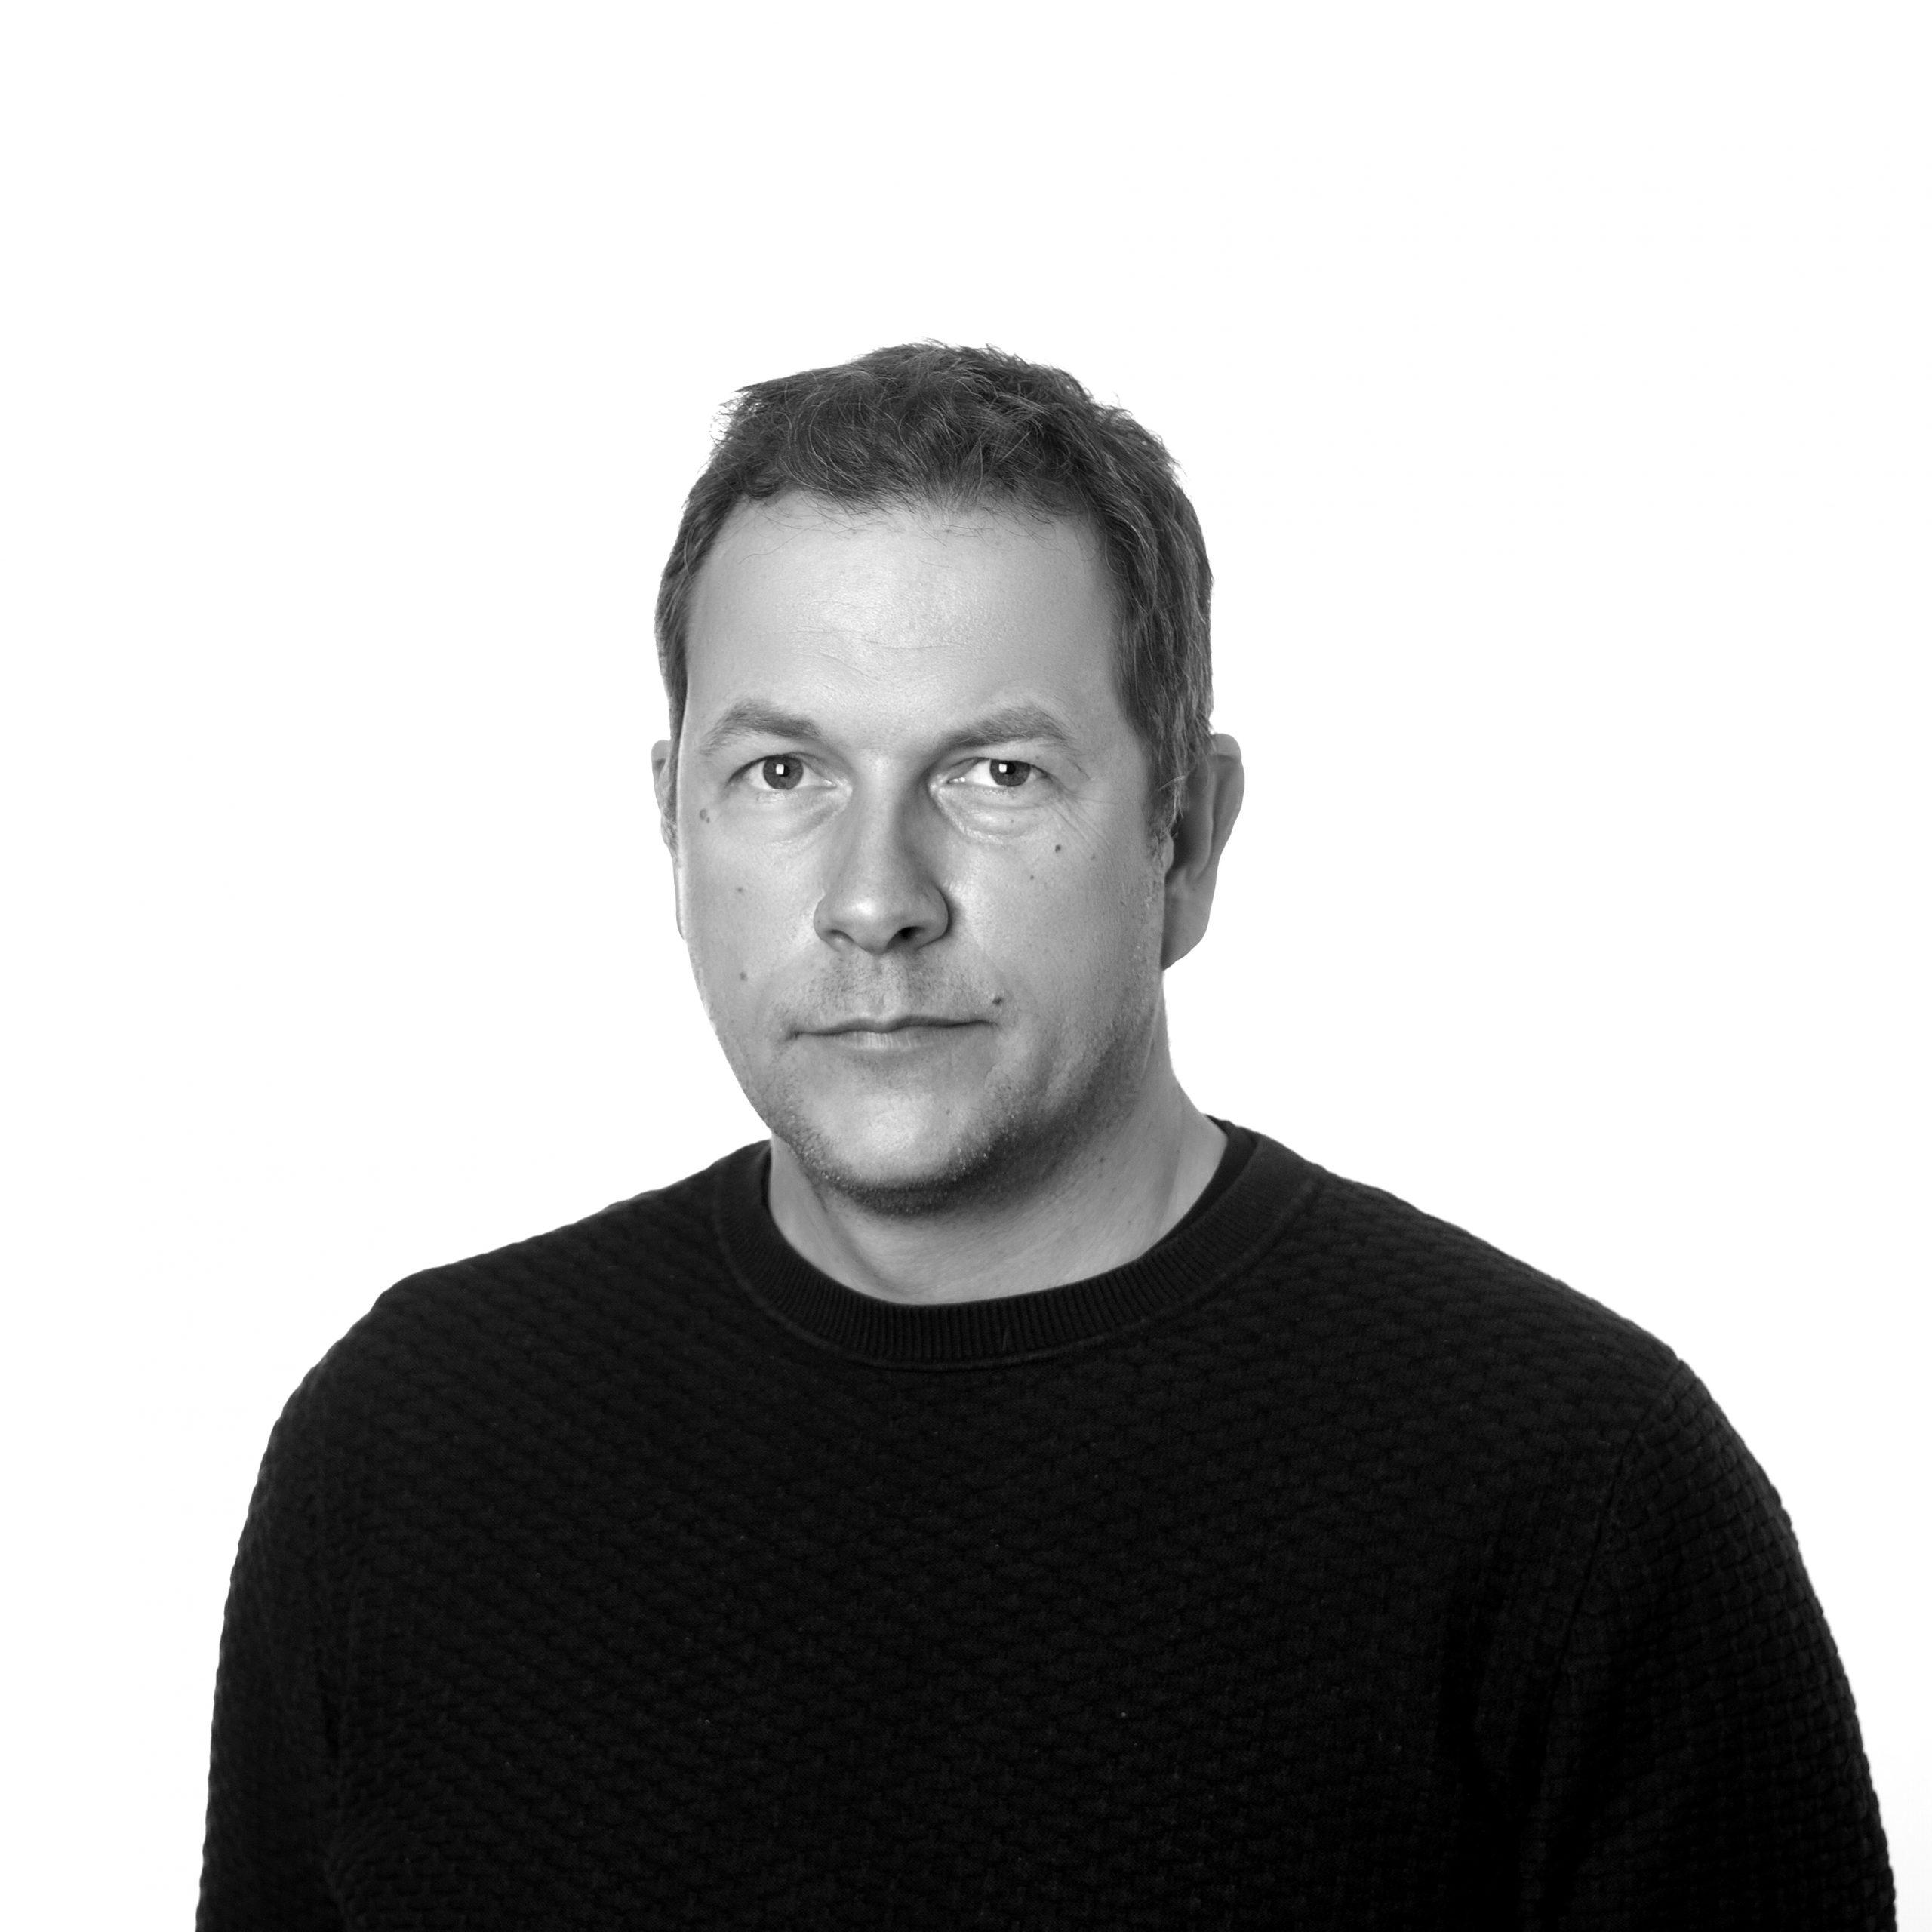 Karl-Kristian Høiseth